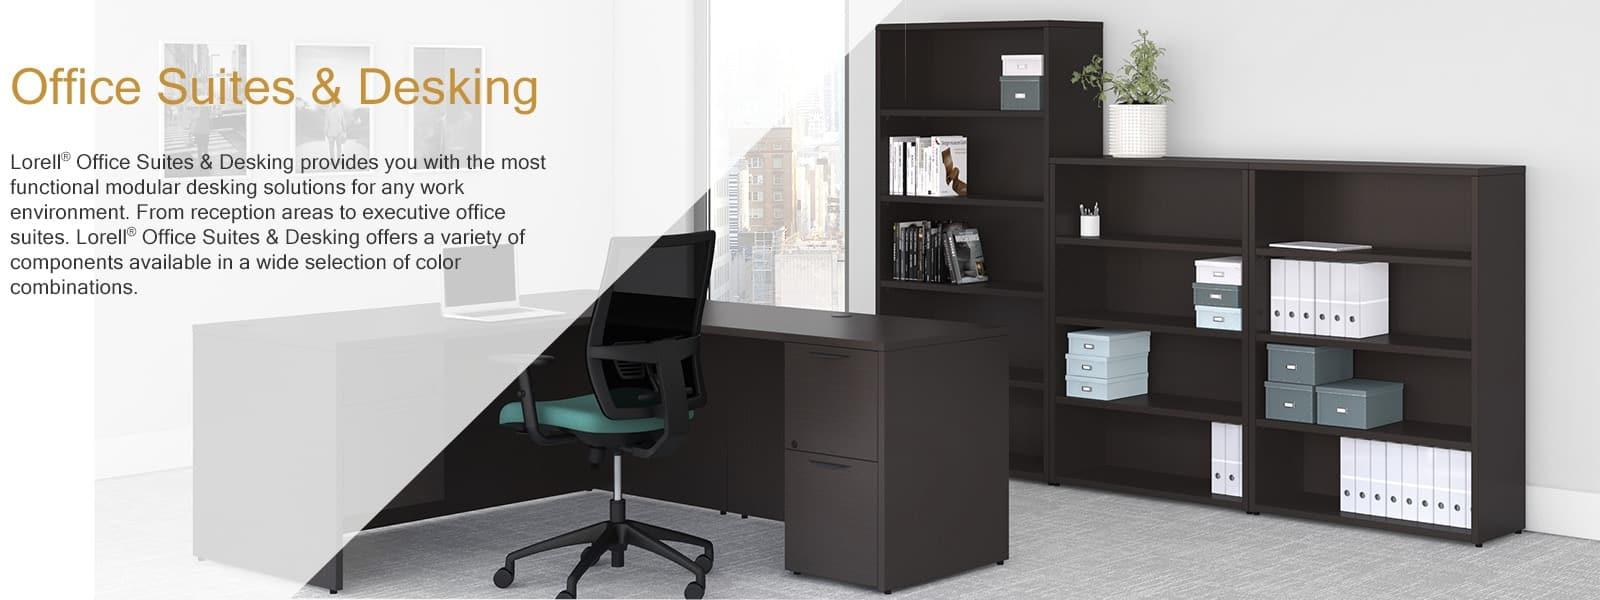 hero-office-suites-and-desks